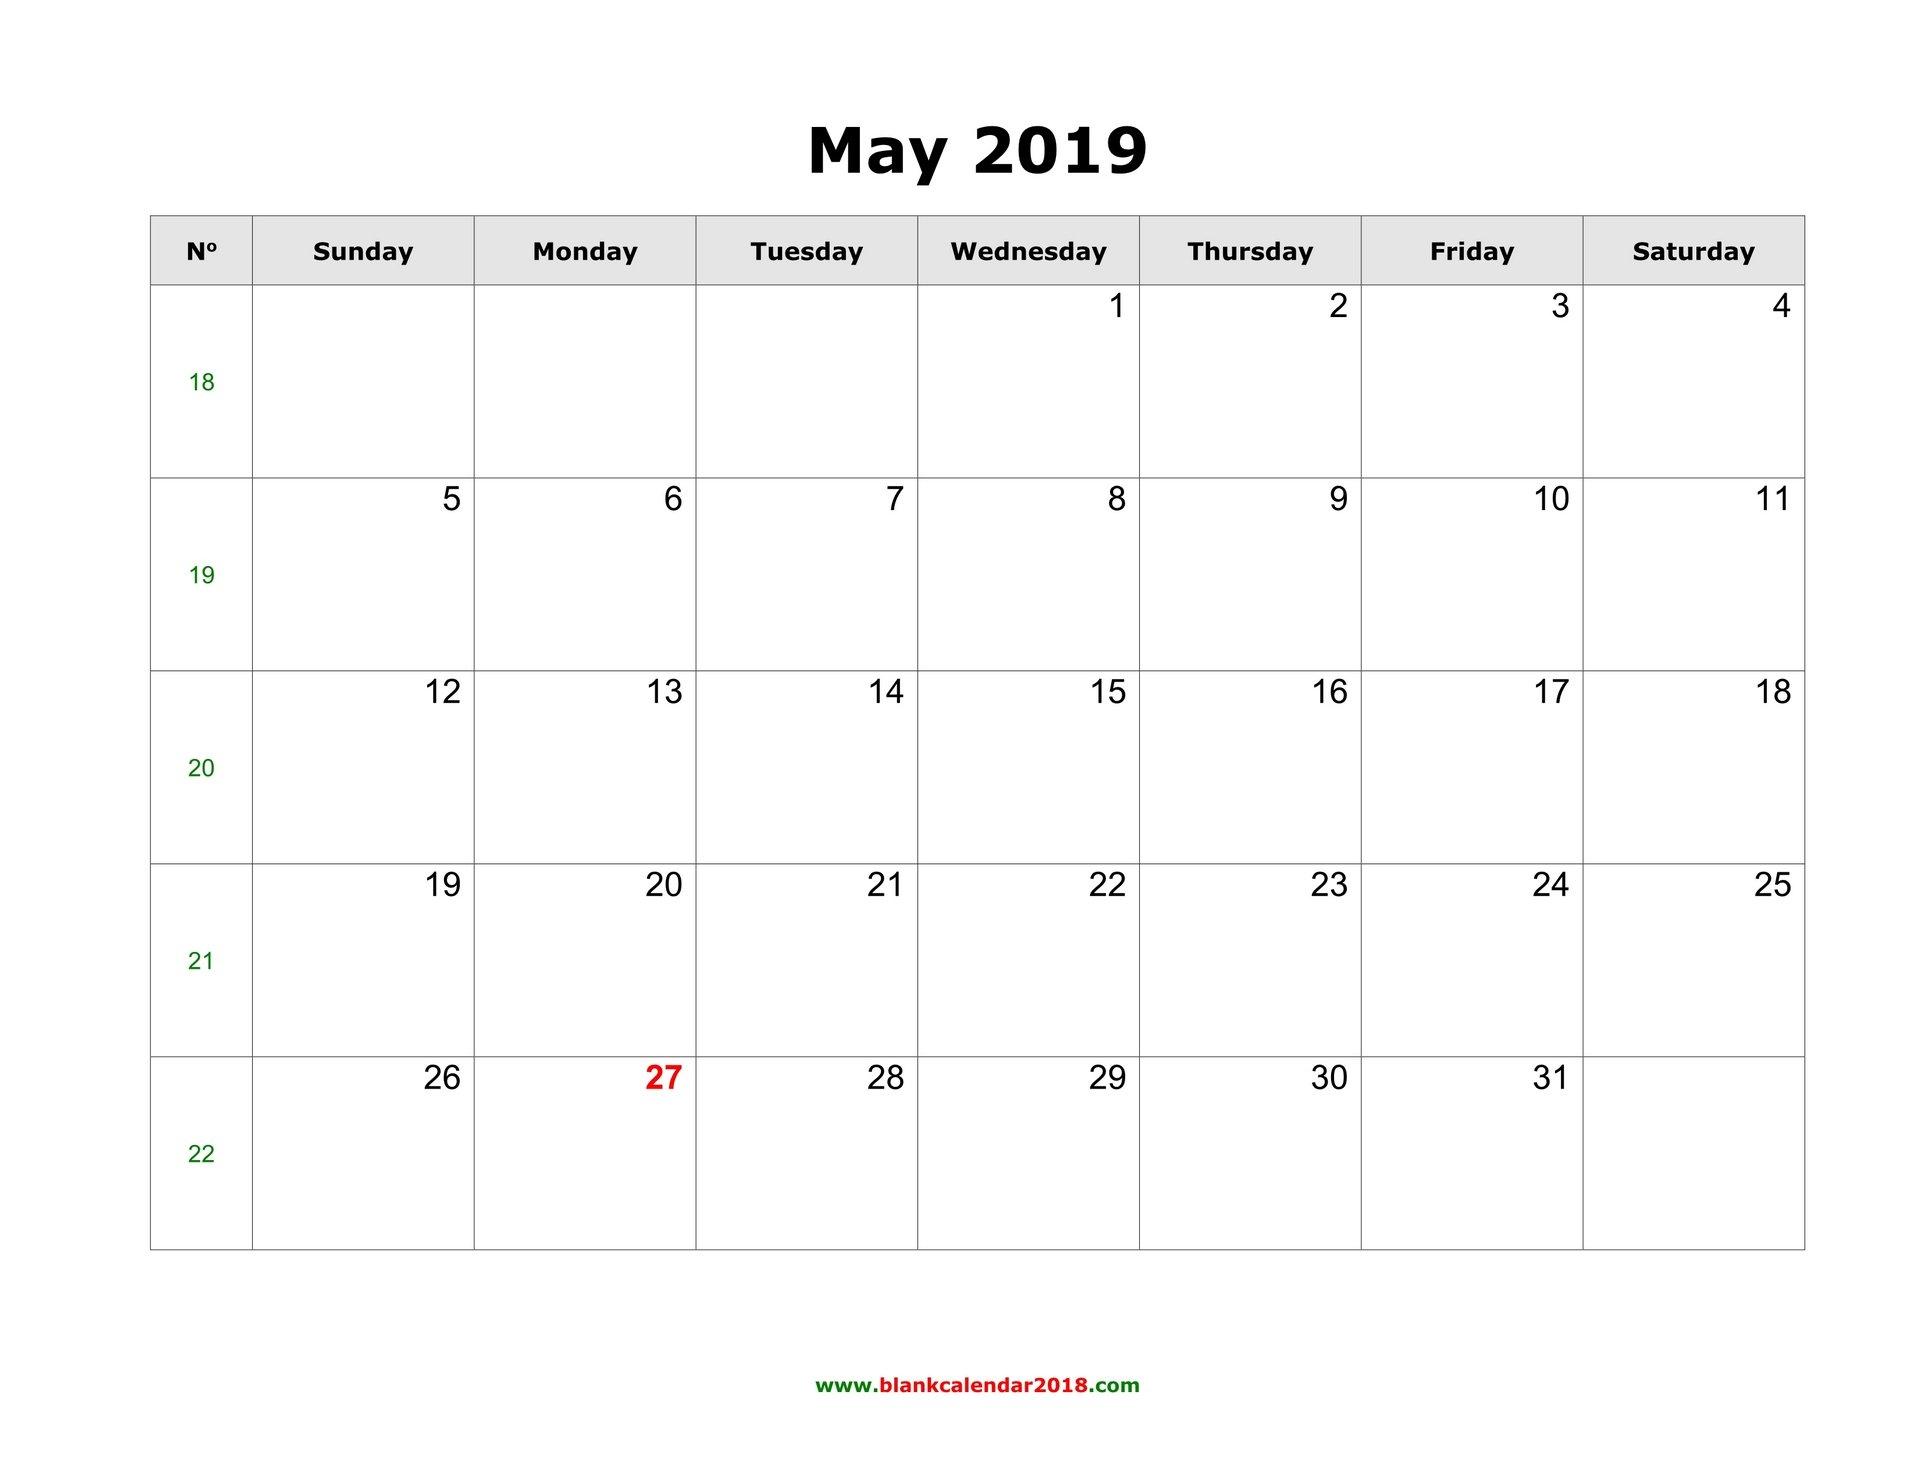 Blank Calendar For May 2019 Calendar 2019 Template Word